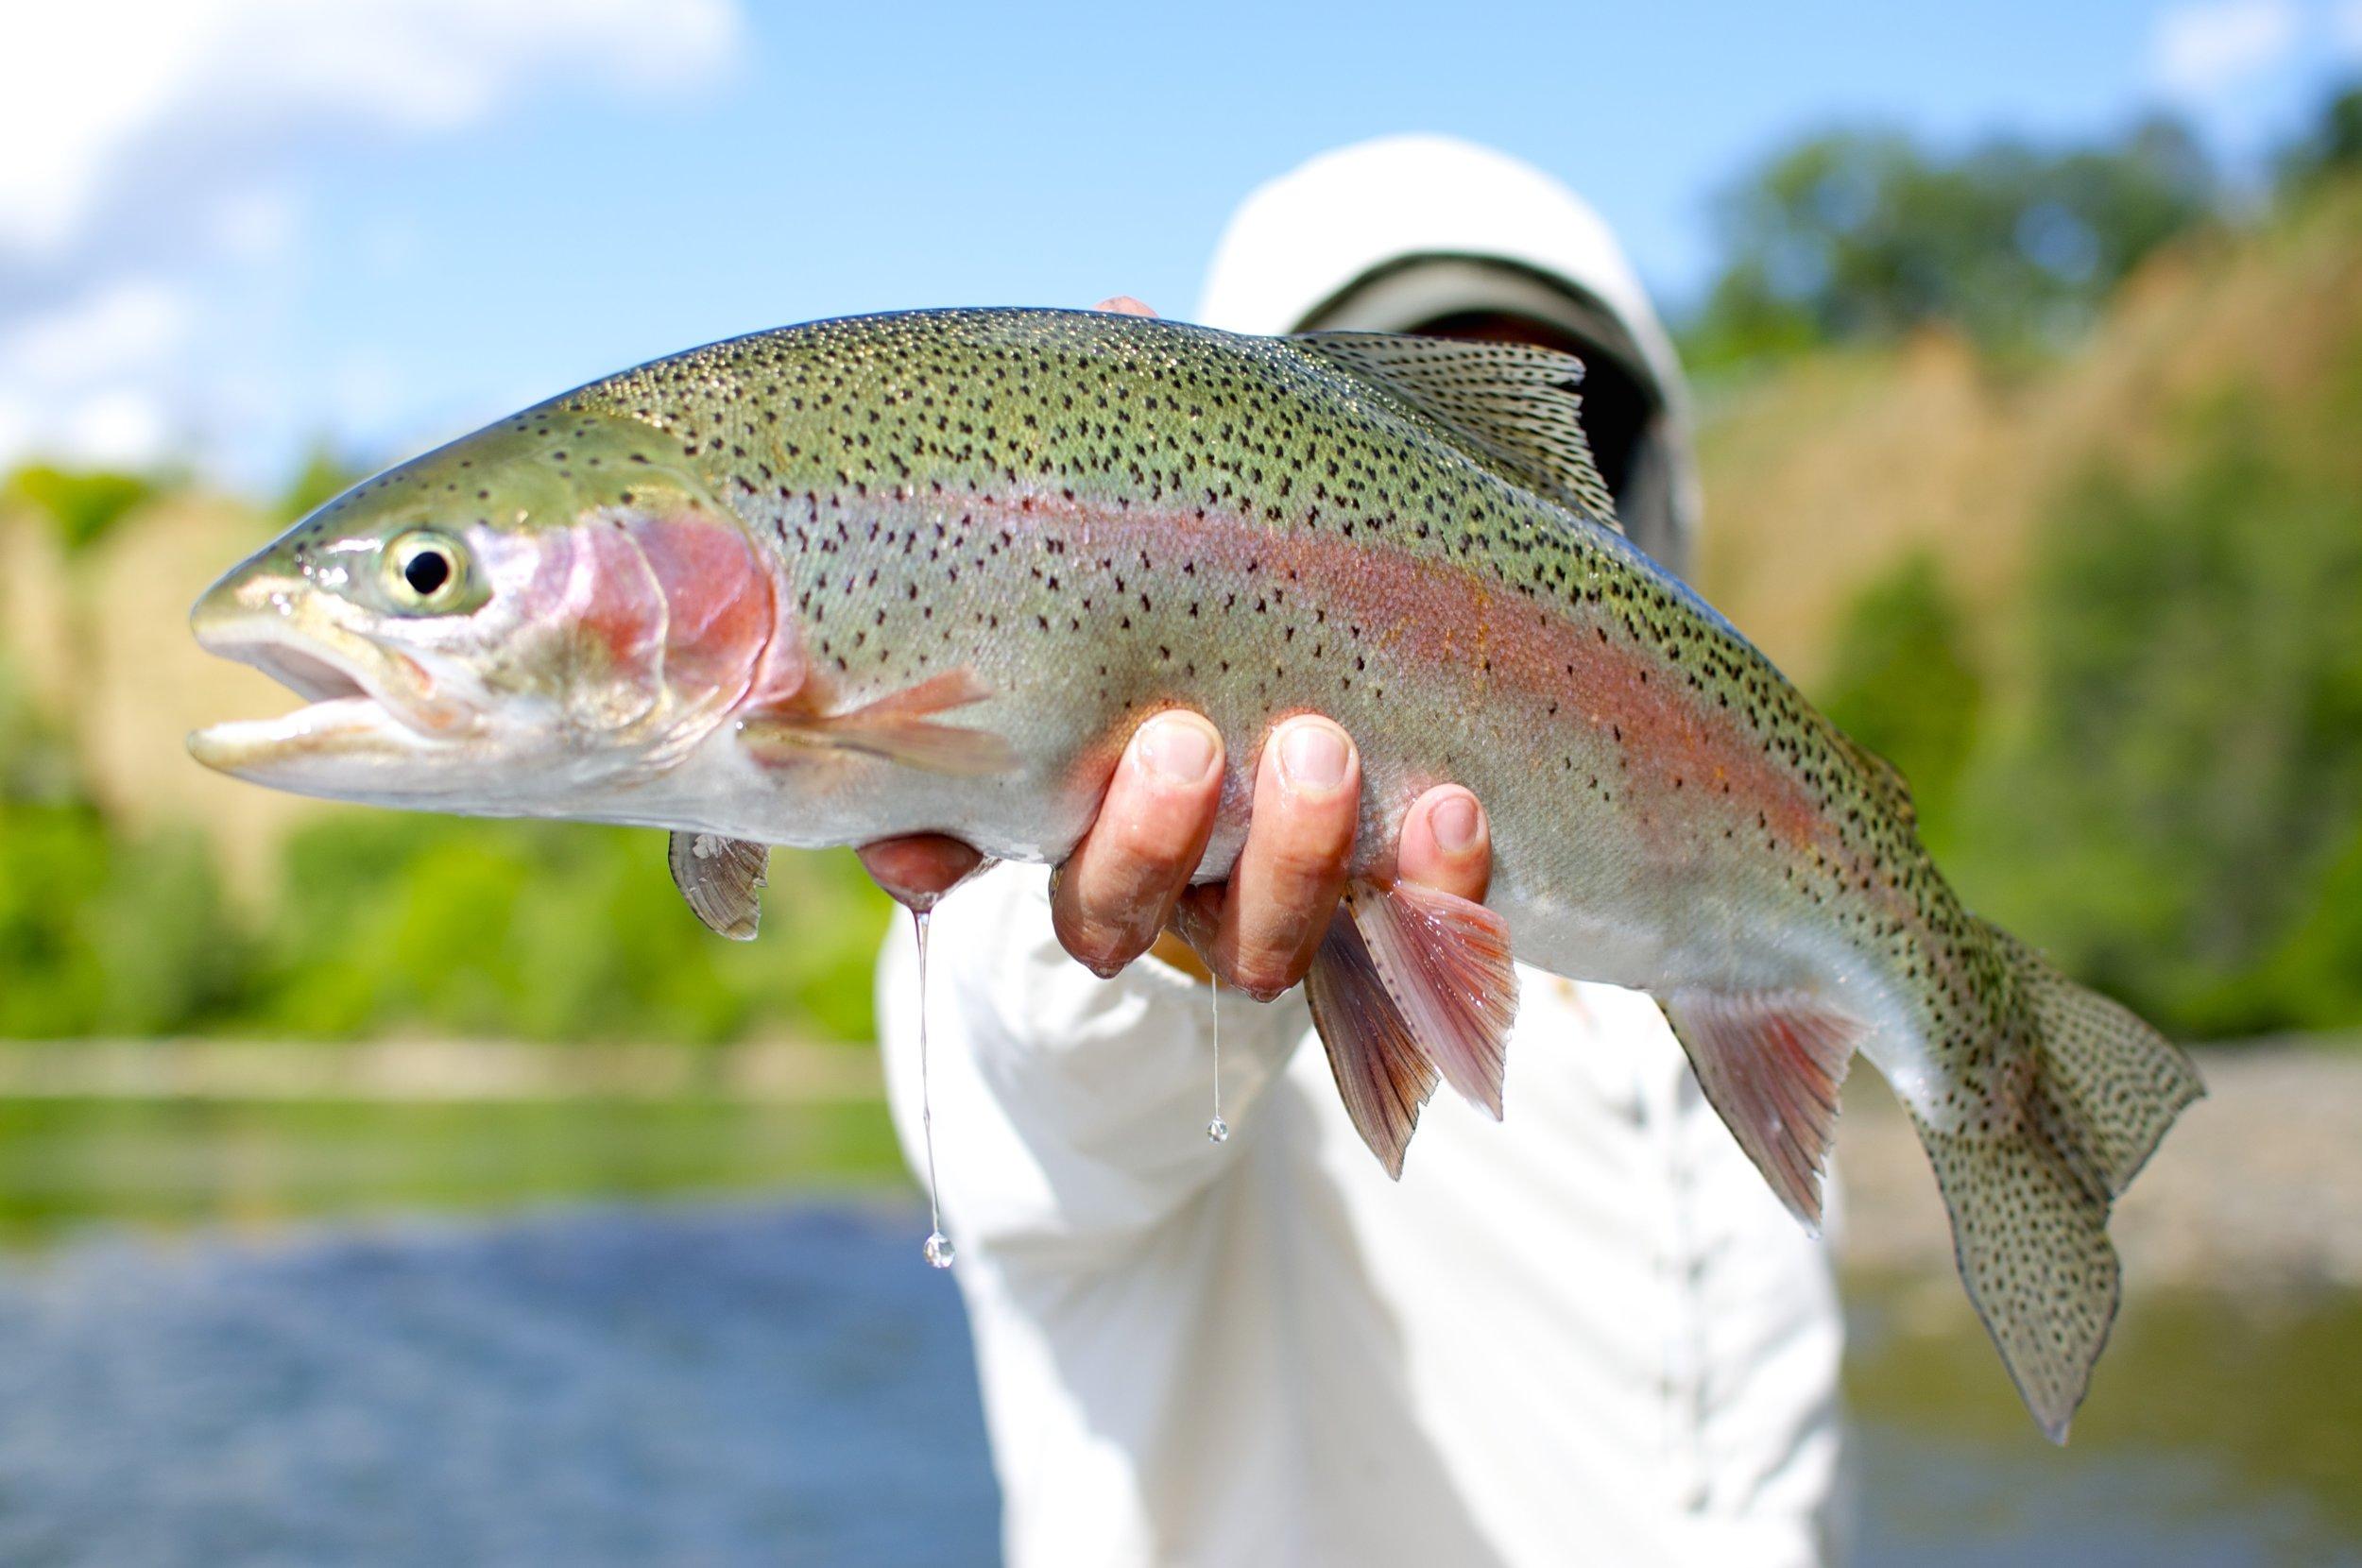 Trout | steelhead | bass | Salmon